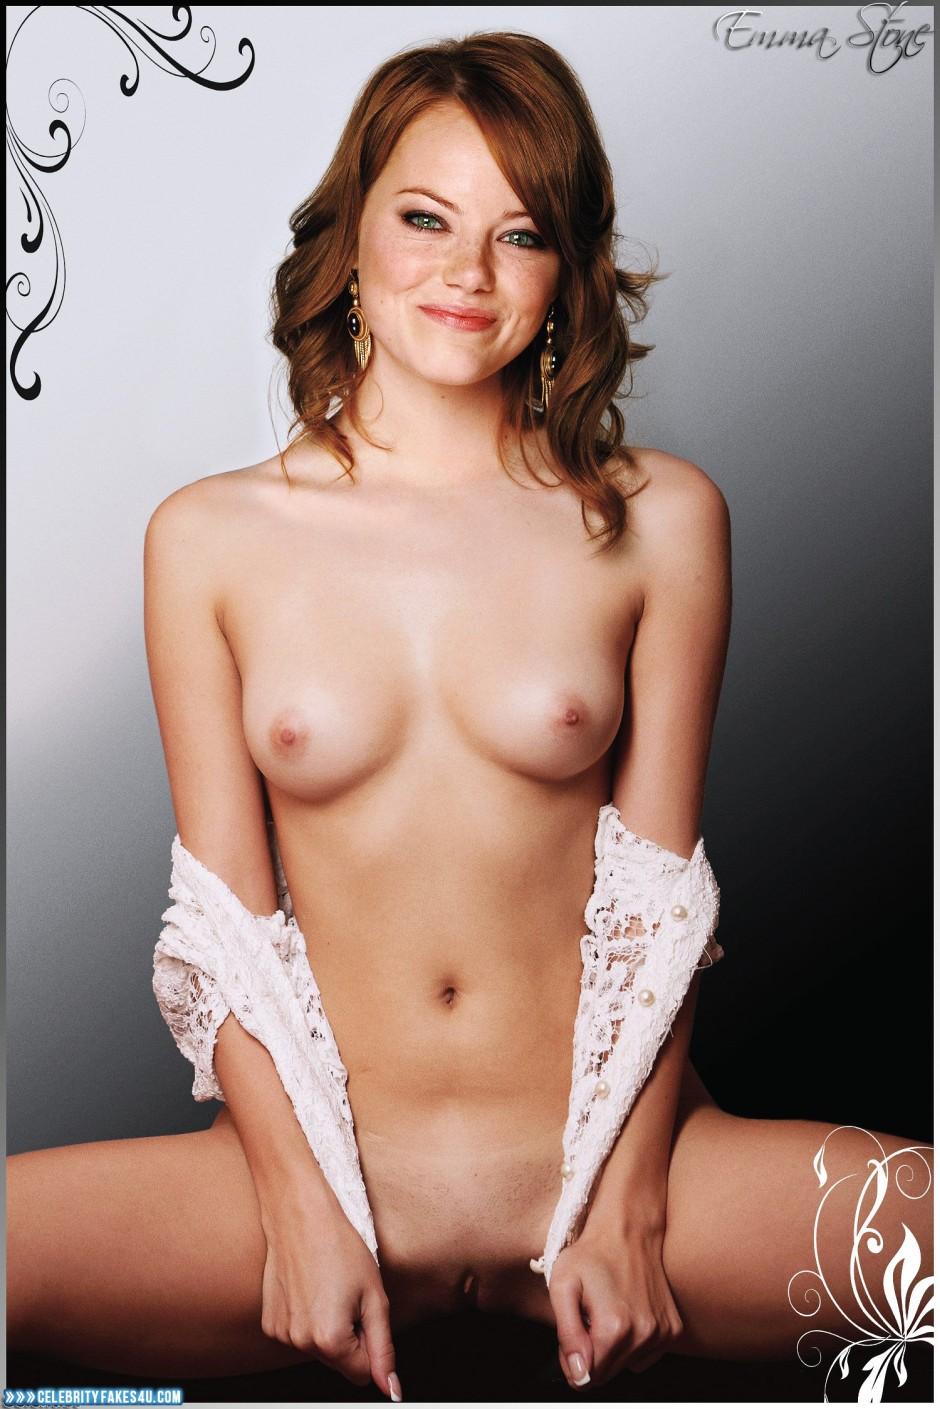 Emma stone tits porn